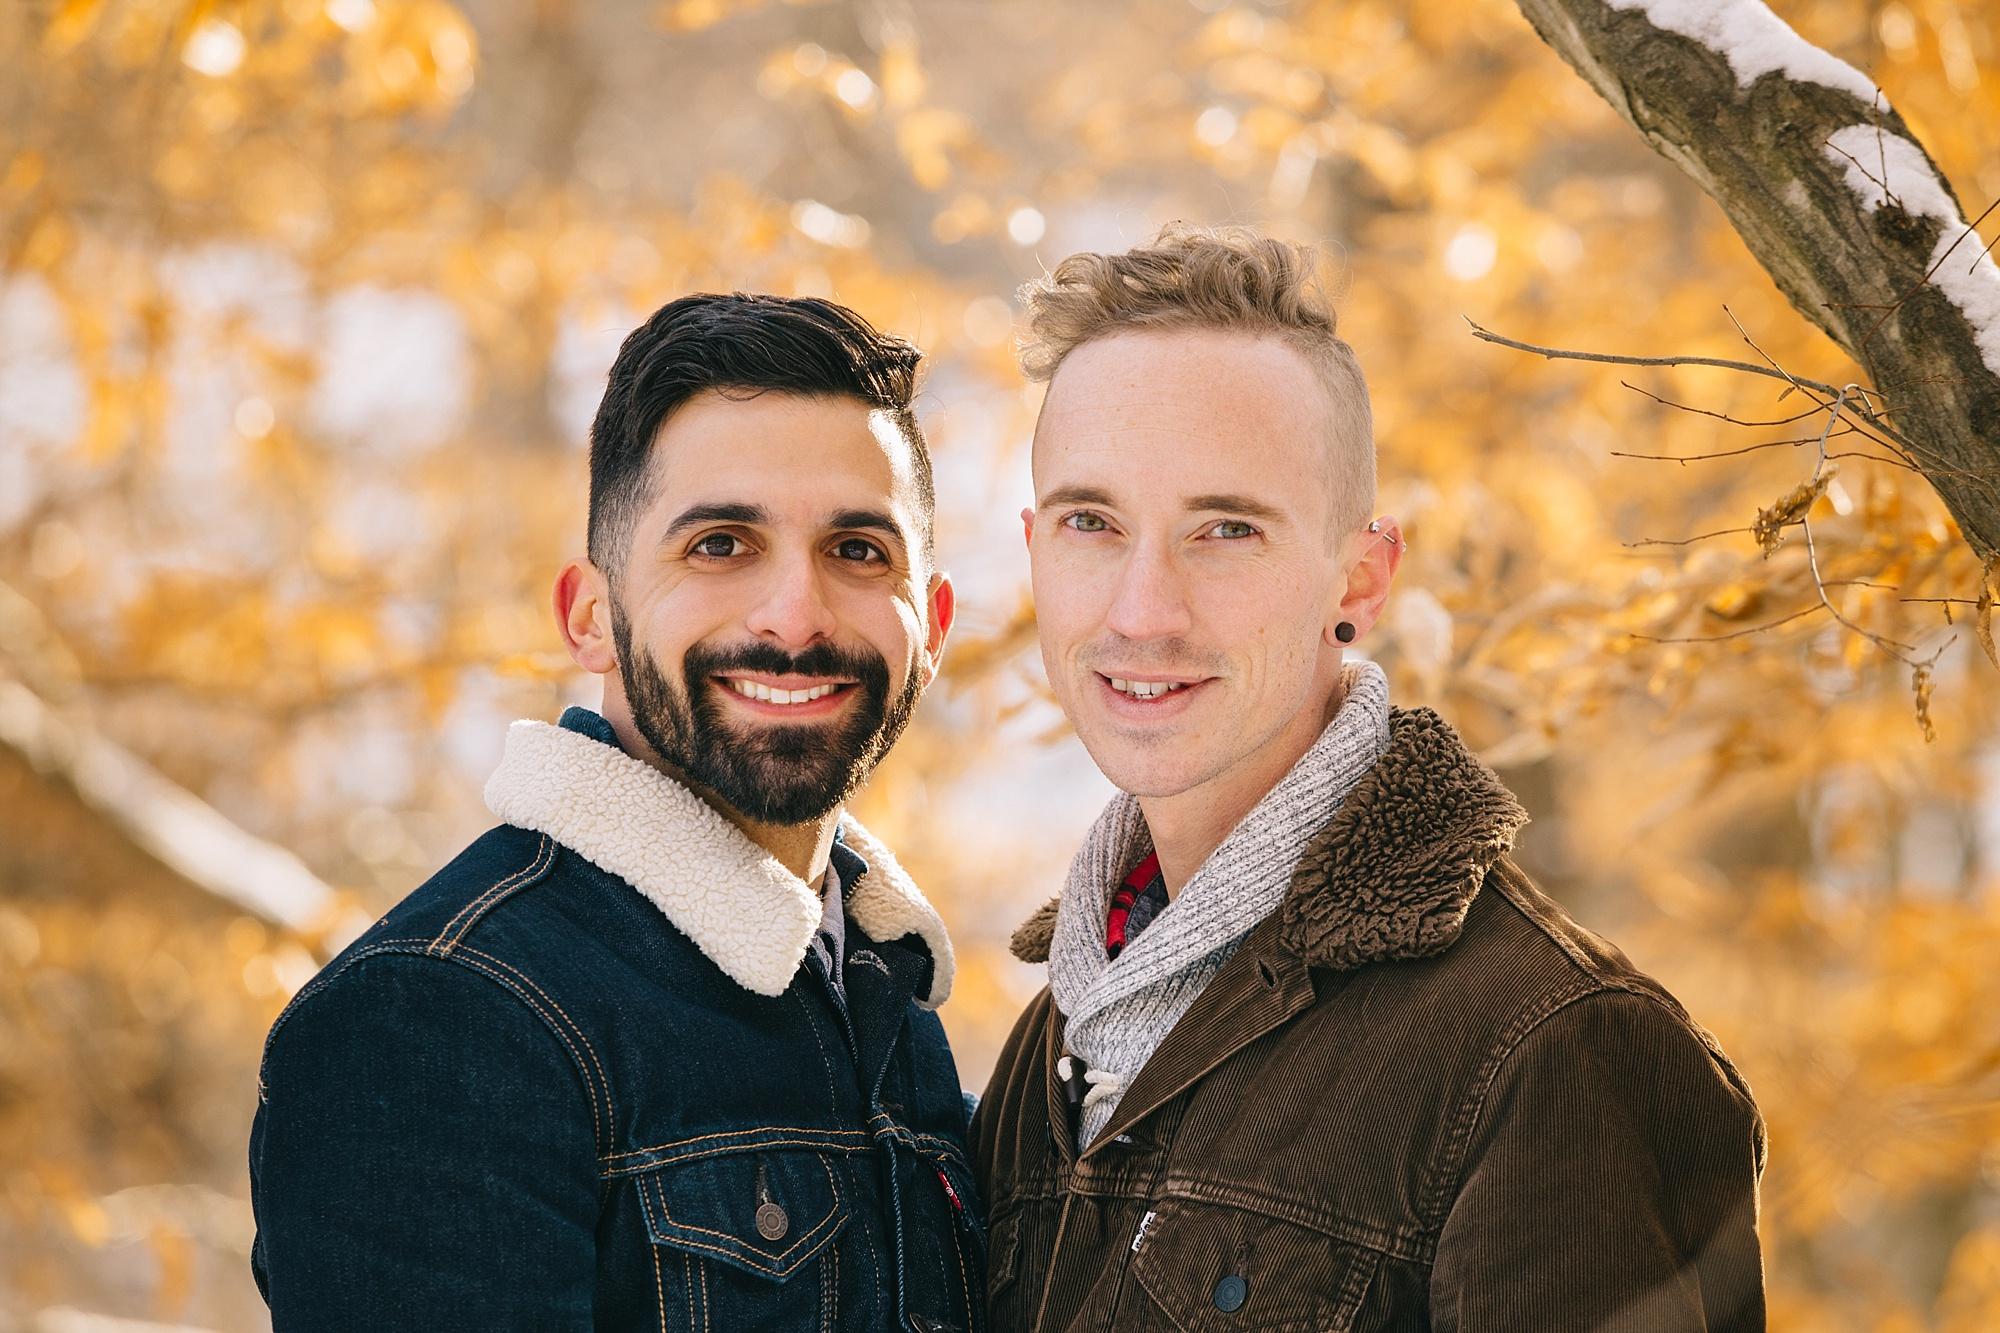 Joe_Mike_Gay_Couple_Photography_LGBT_Wedding_Landscape_0018.JPG